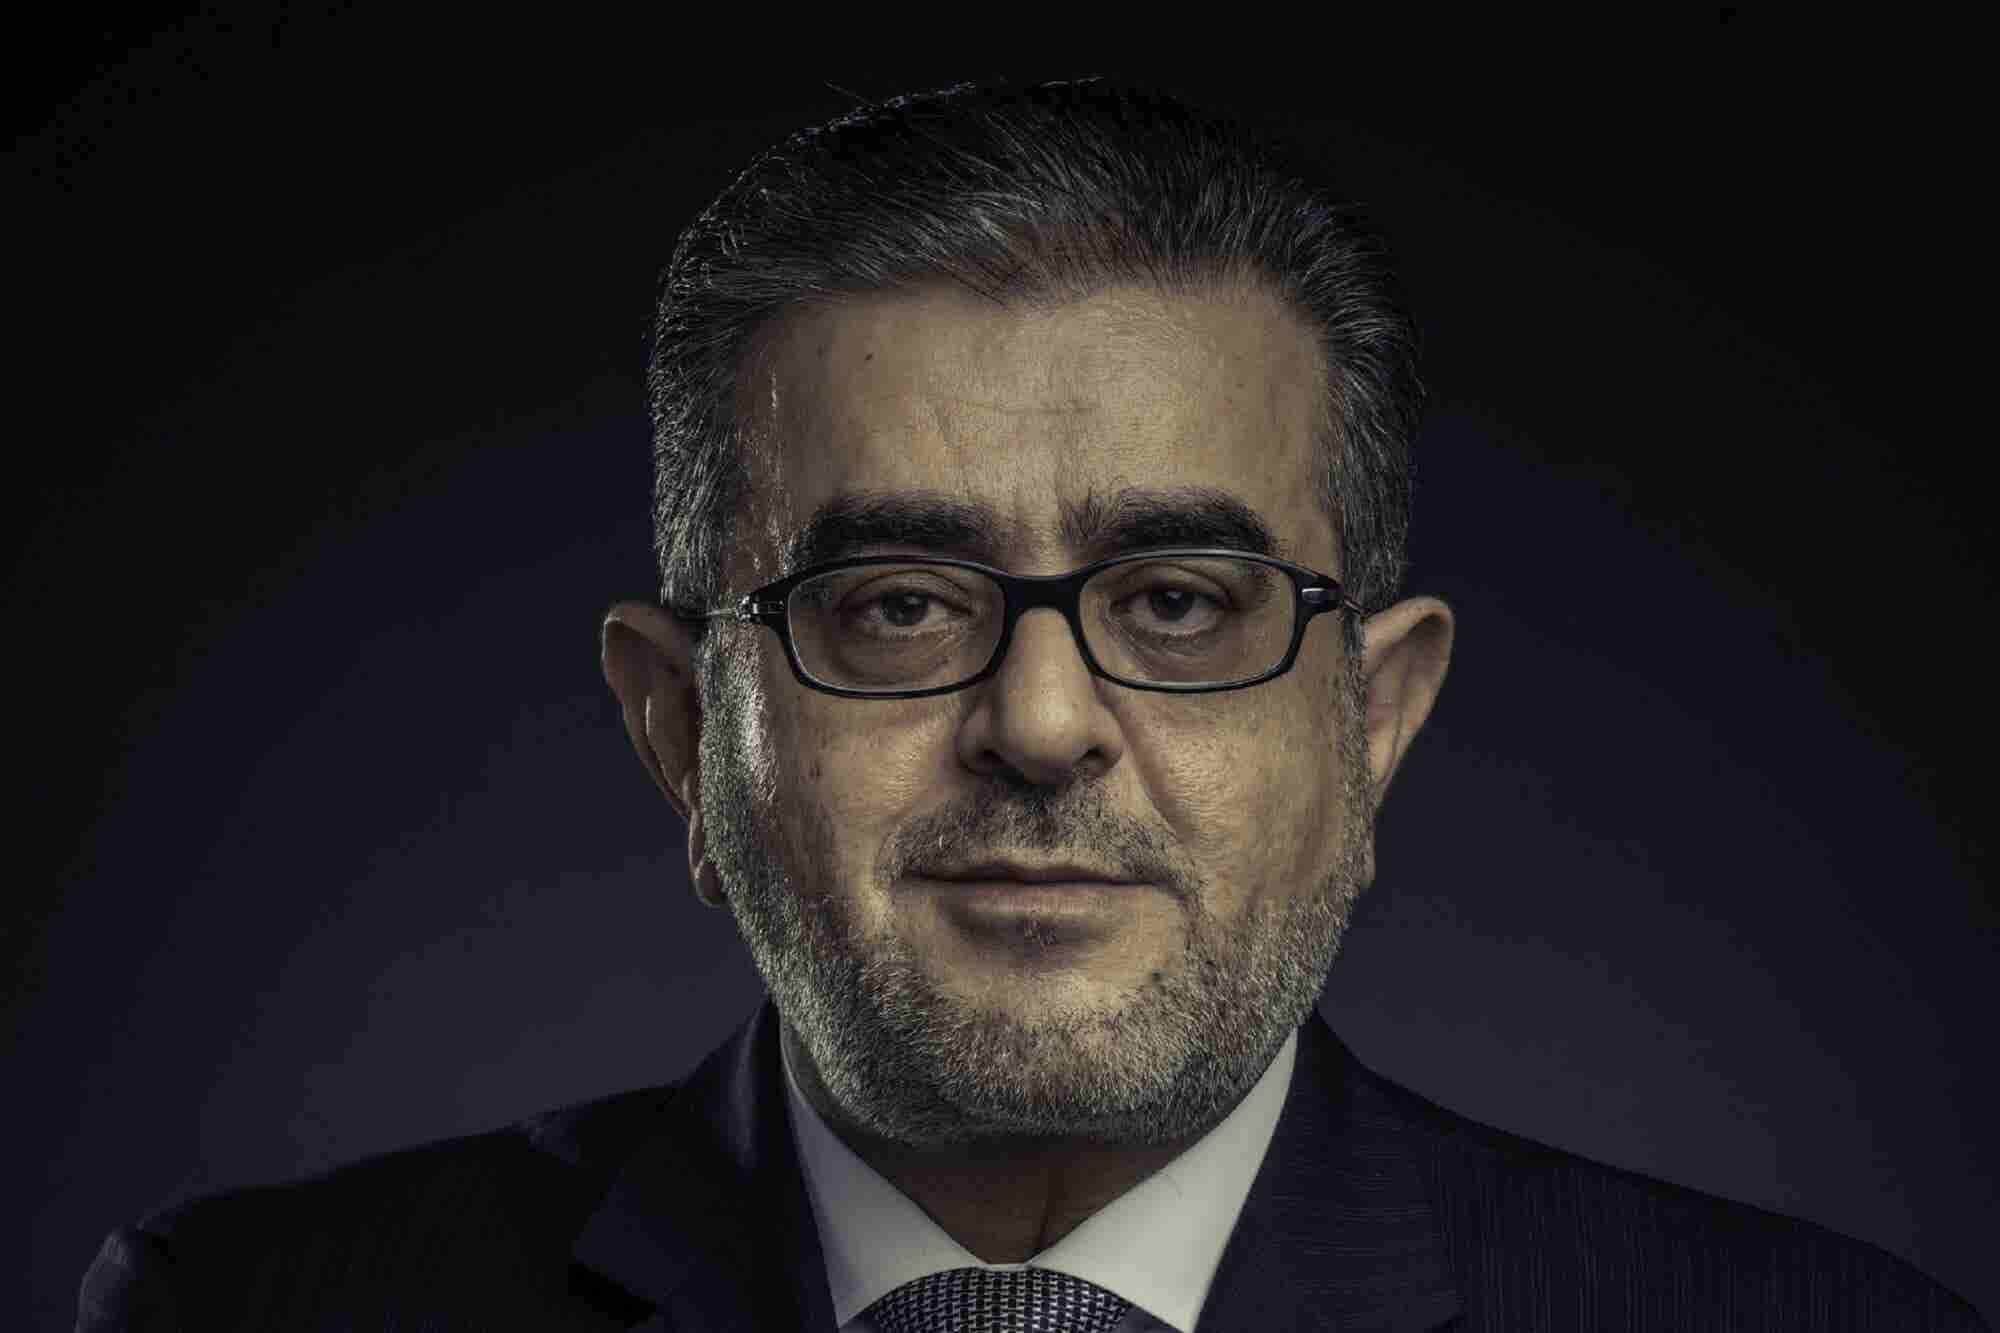 Doubling Down: Basel Talal, Regional Director, Radisson Hotel Group